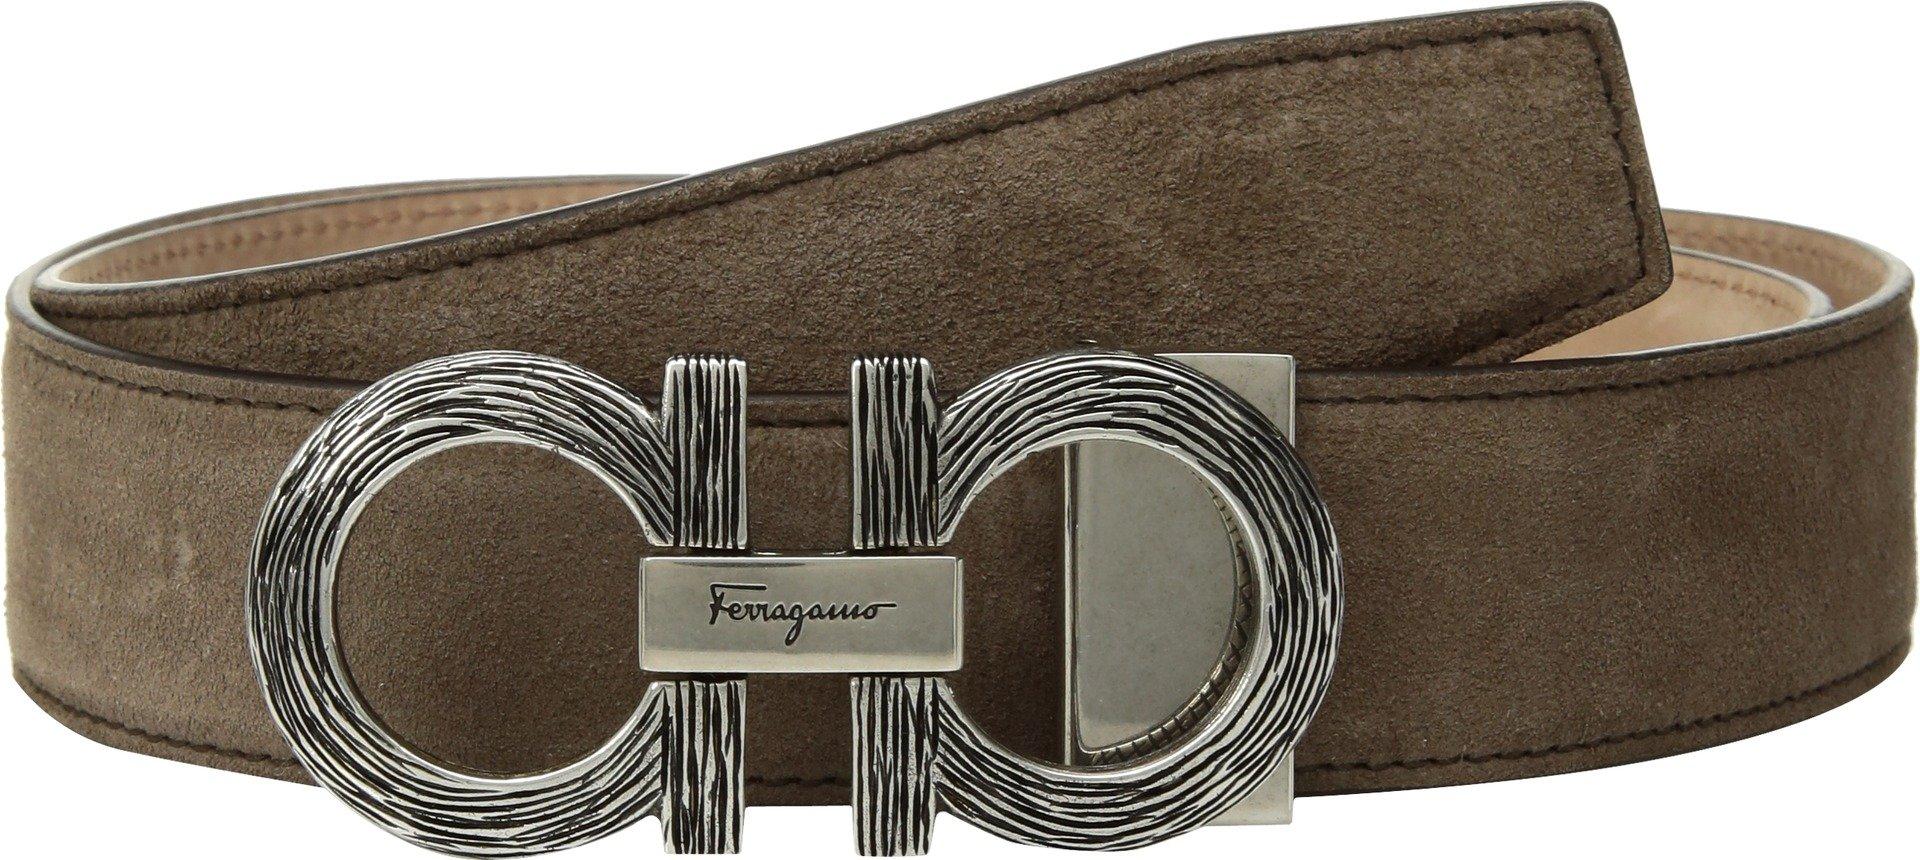 Salvatore Ferragamo  Men's Adjustable Belt - 679922 Sepia 32